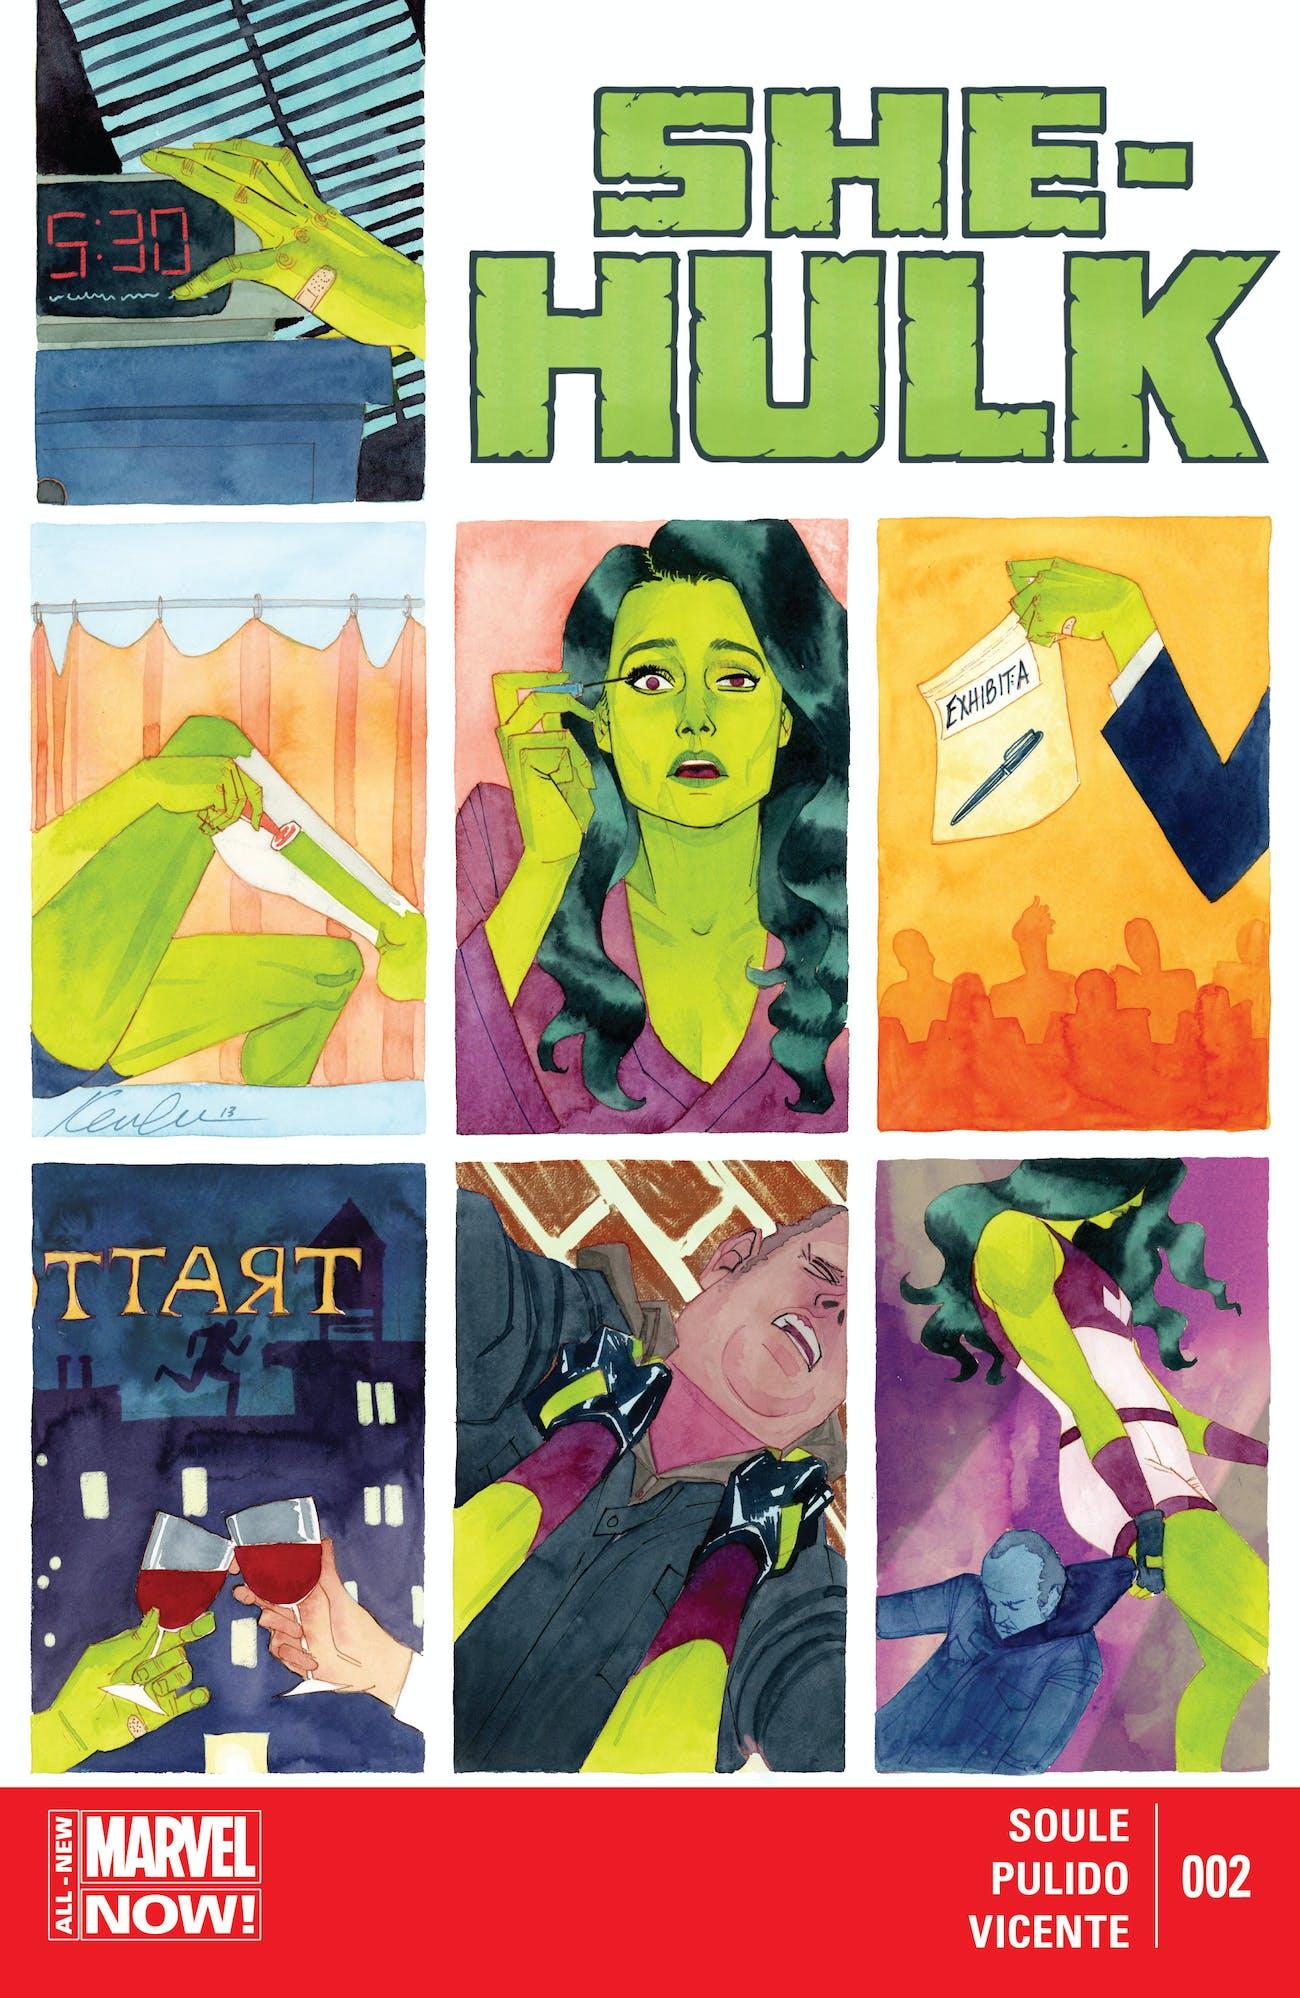 She-Hulk Issue 2 Cover